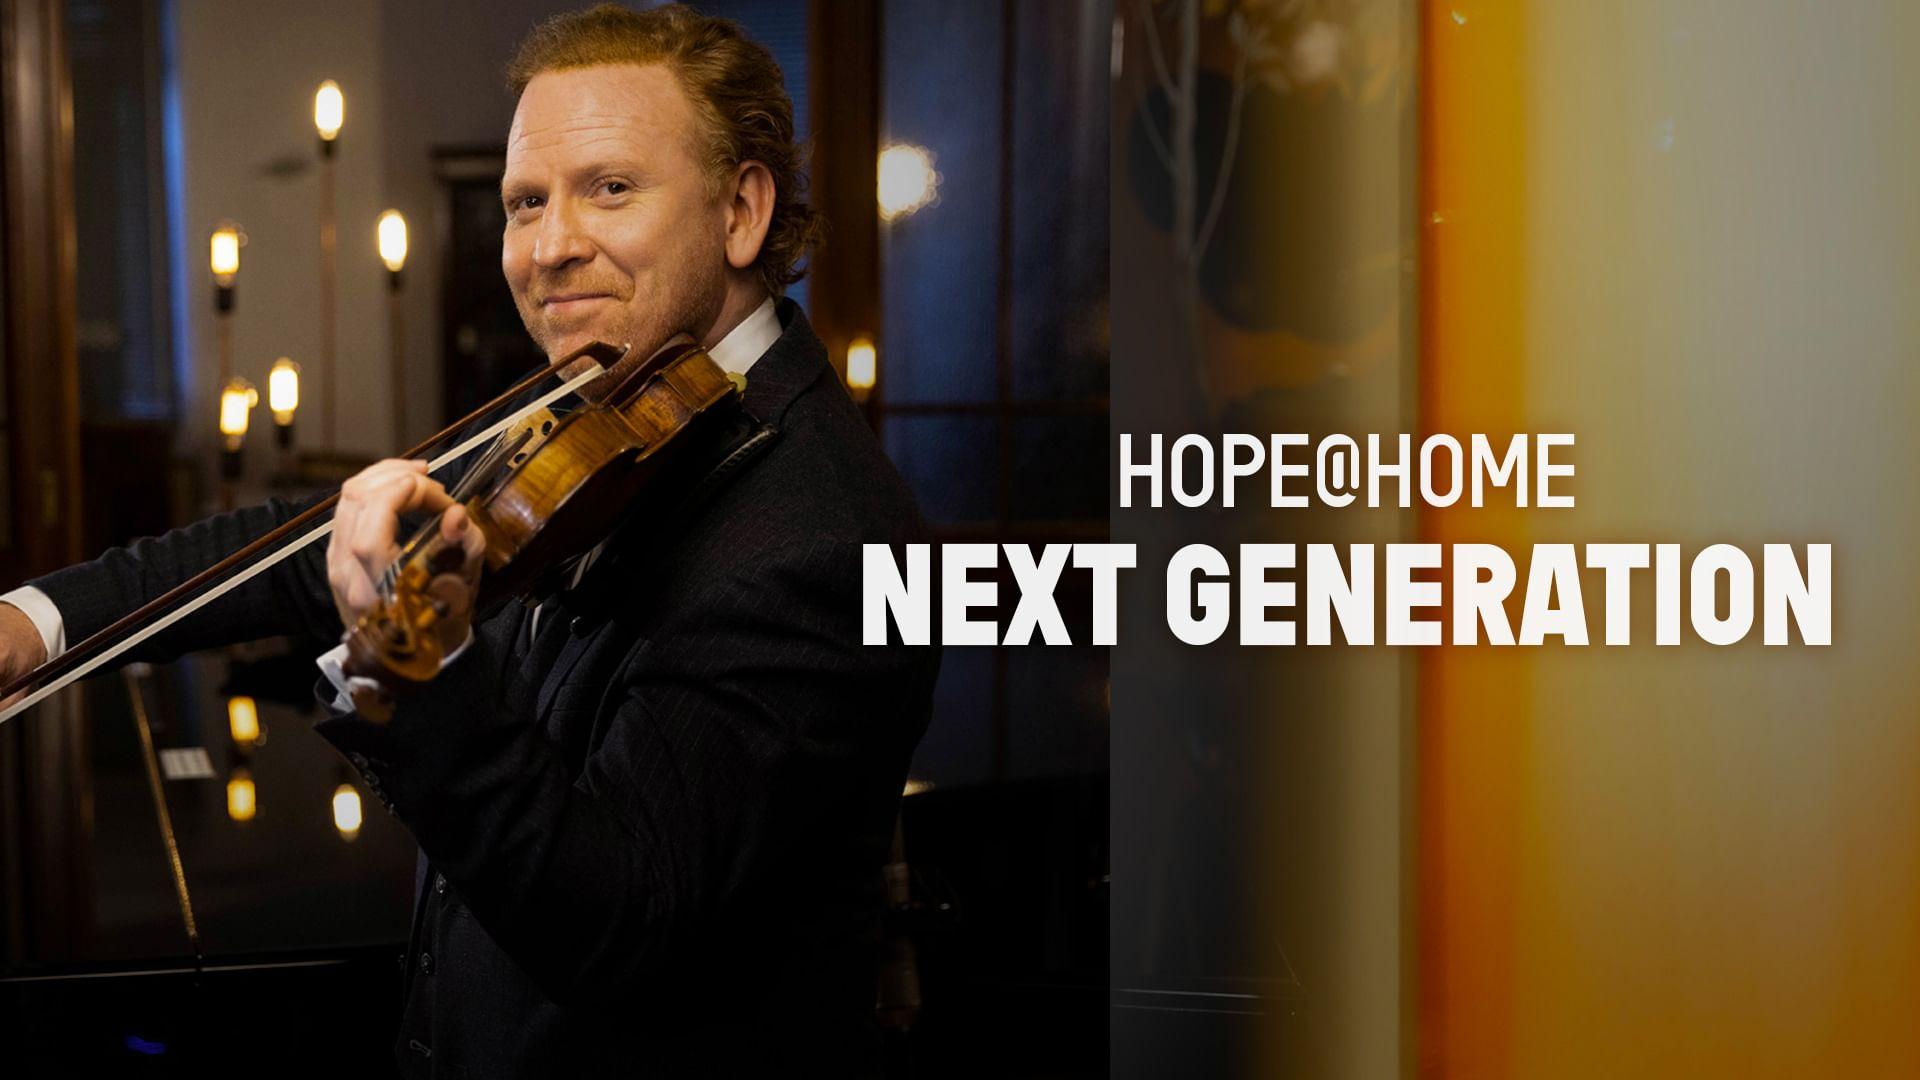 Hope@Home – Next Generation